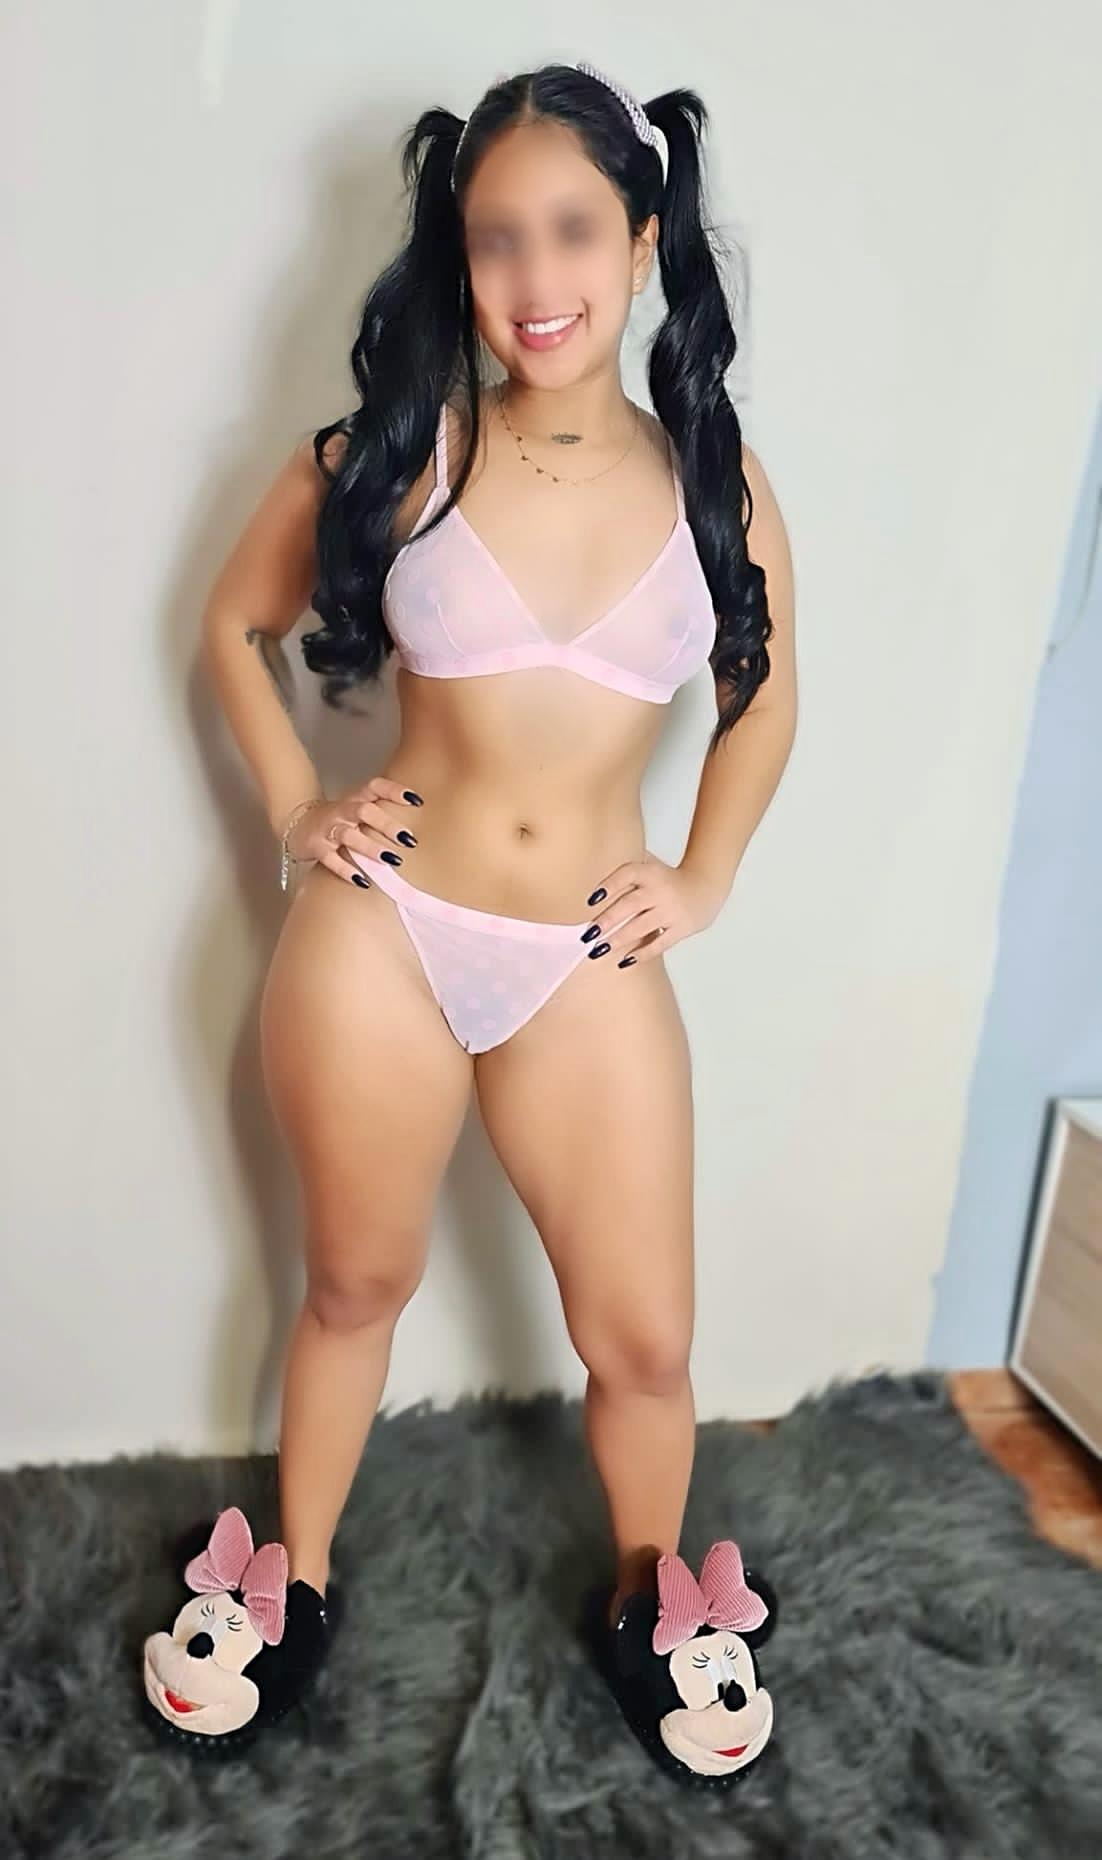 escorts murcia y putas murcia - 618931108 - escort